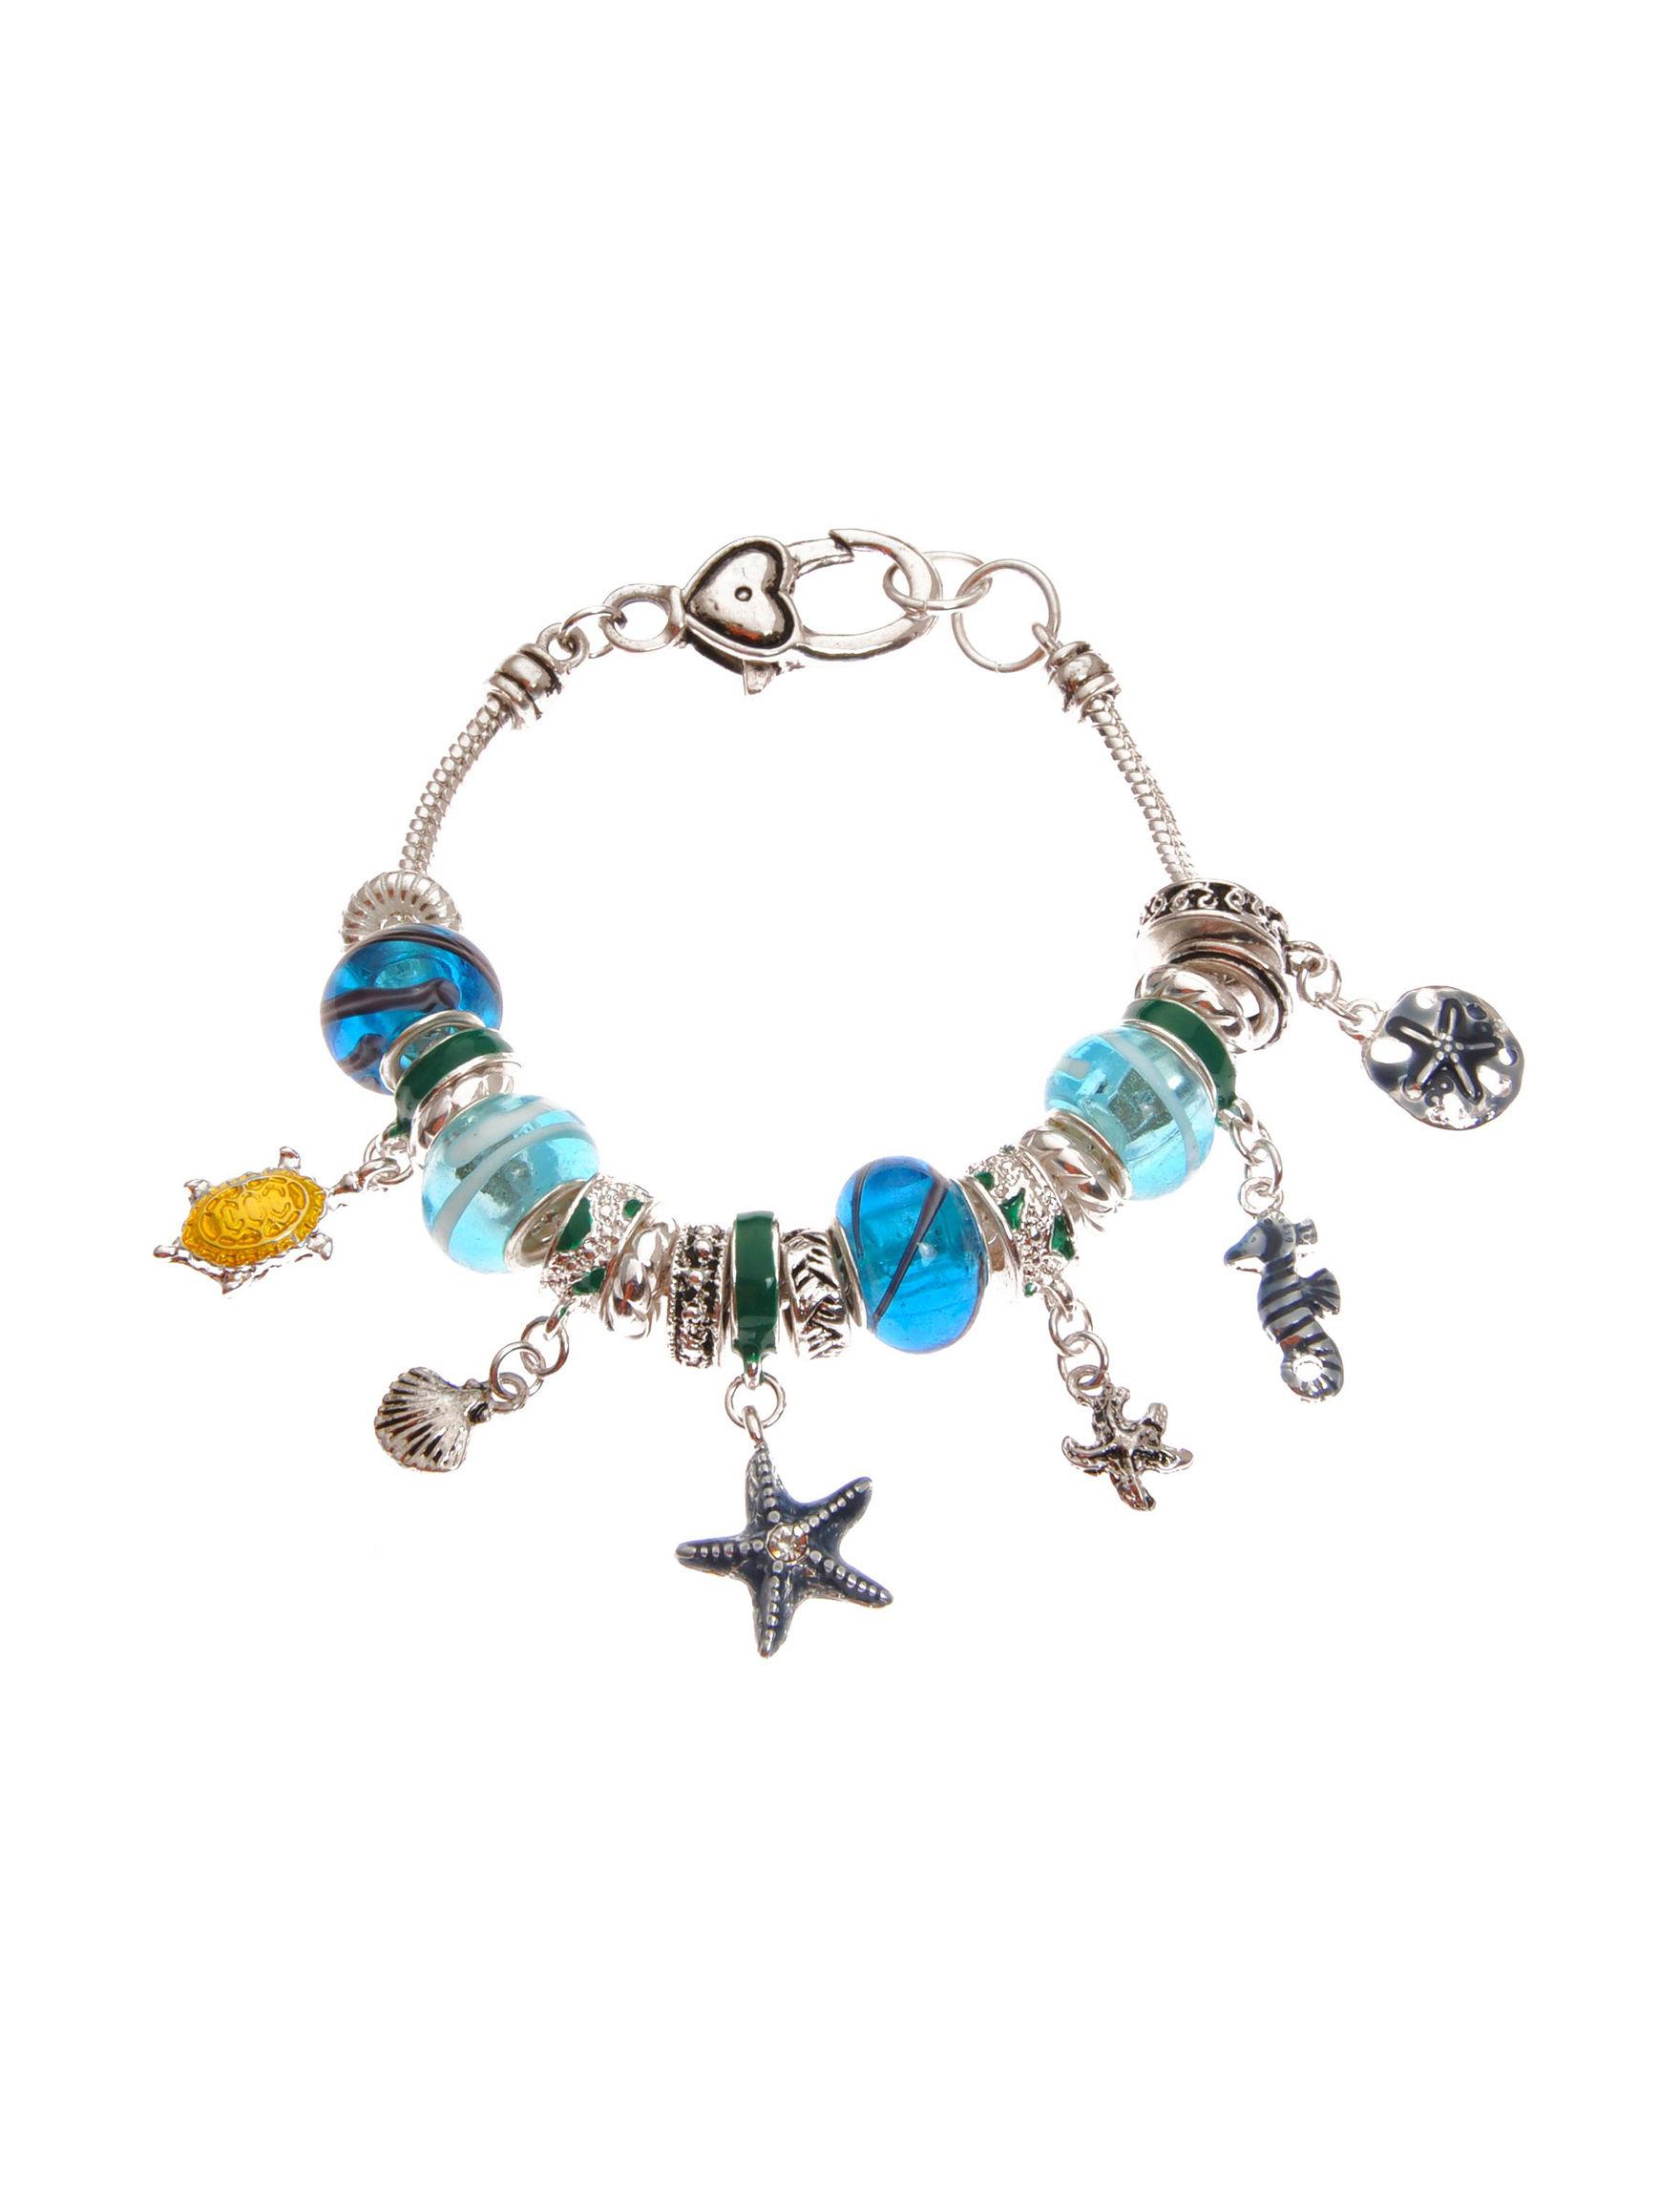 Tanya Blue / Multi Bracelets Fashion Jewelry